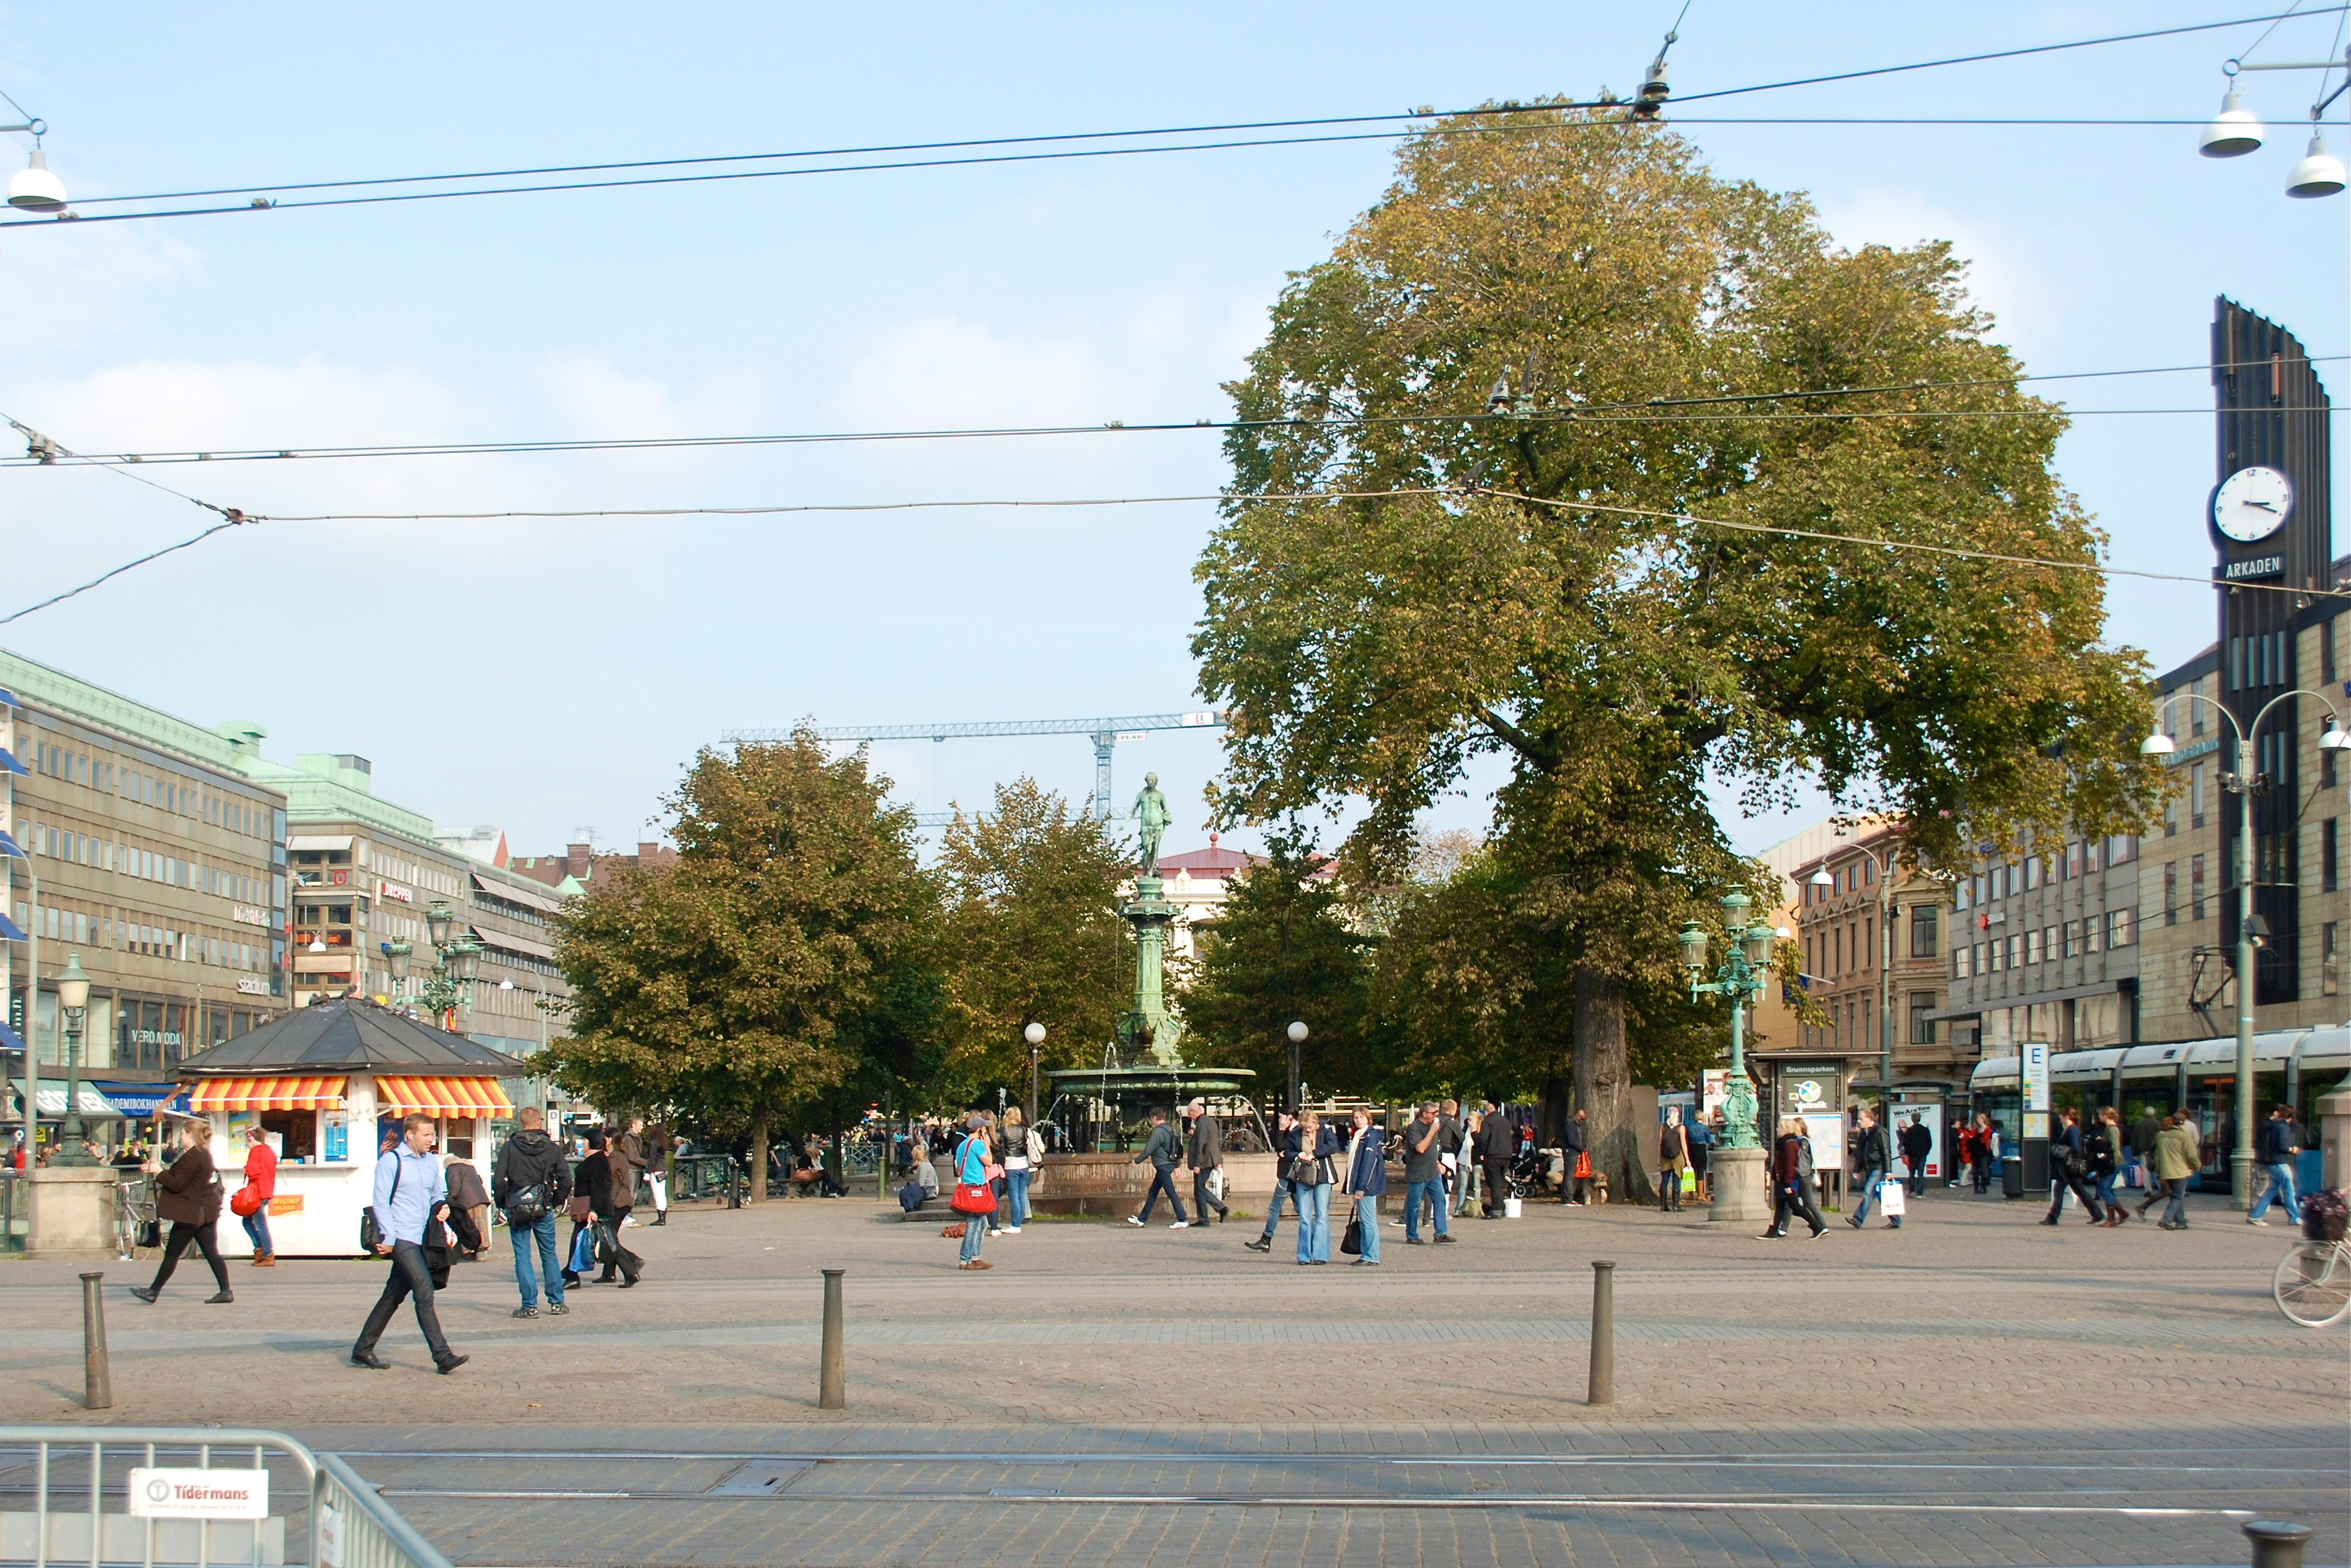 high end ledsagare bröst i Göteborg